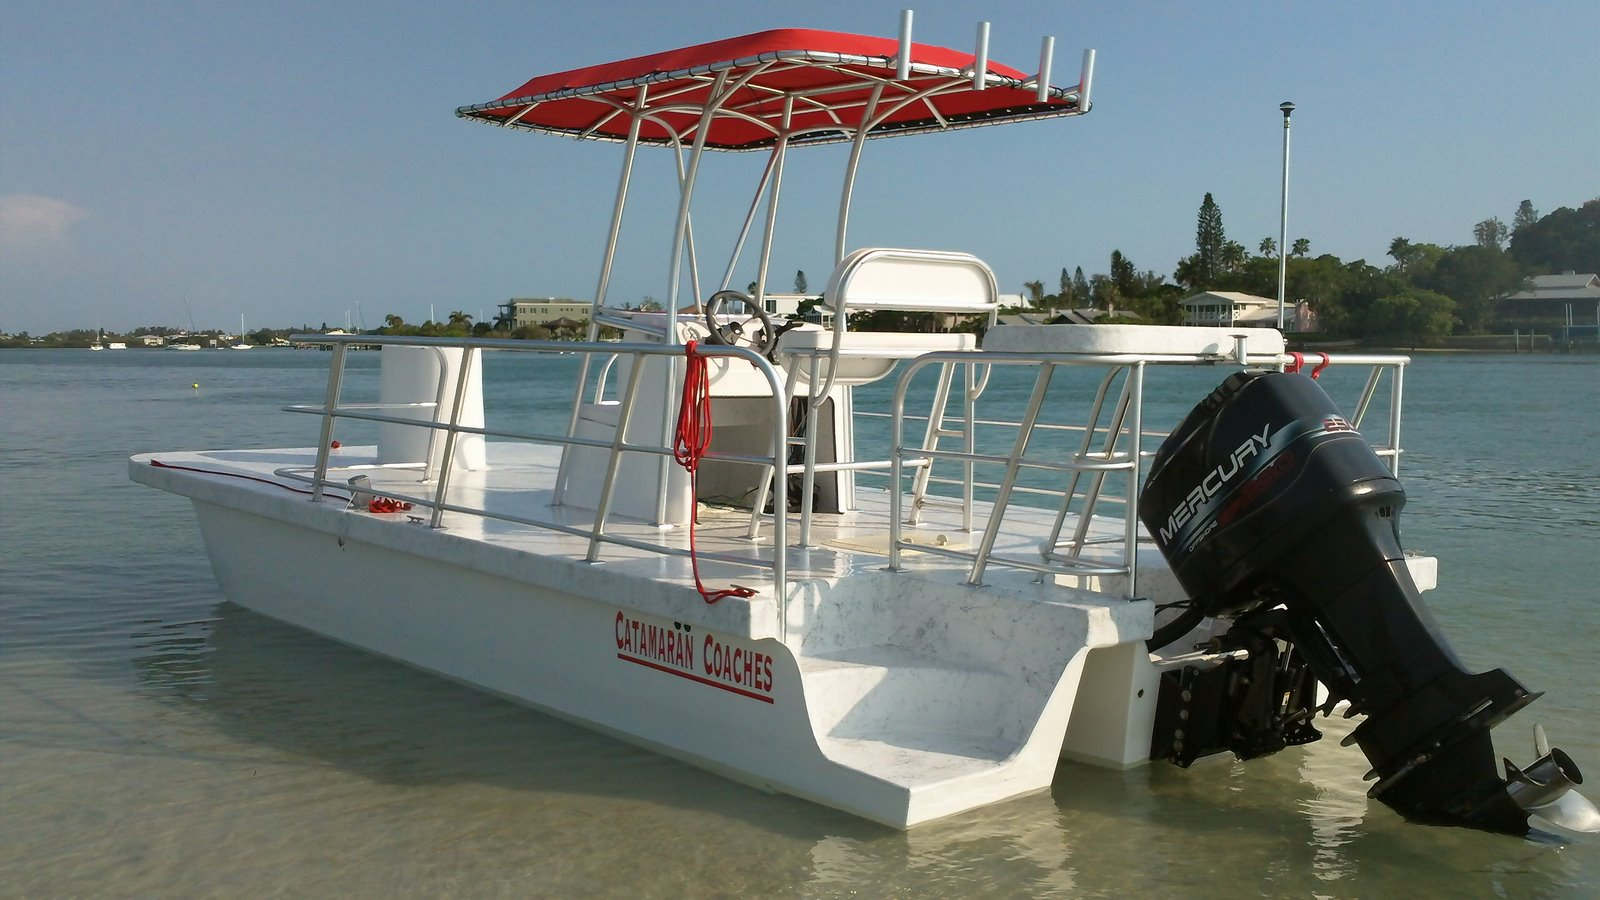 Catamaran coaches pontoon boats for Fishing pontoon boats